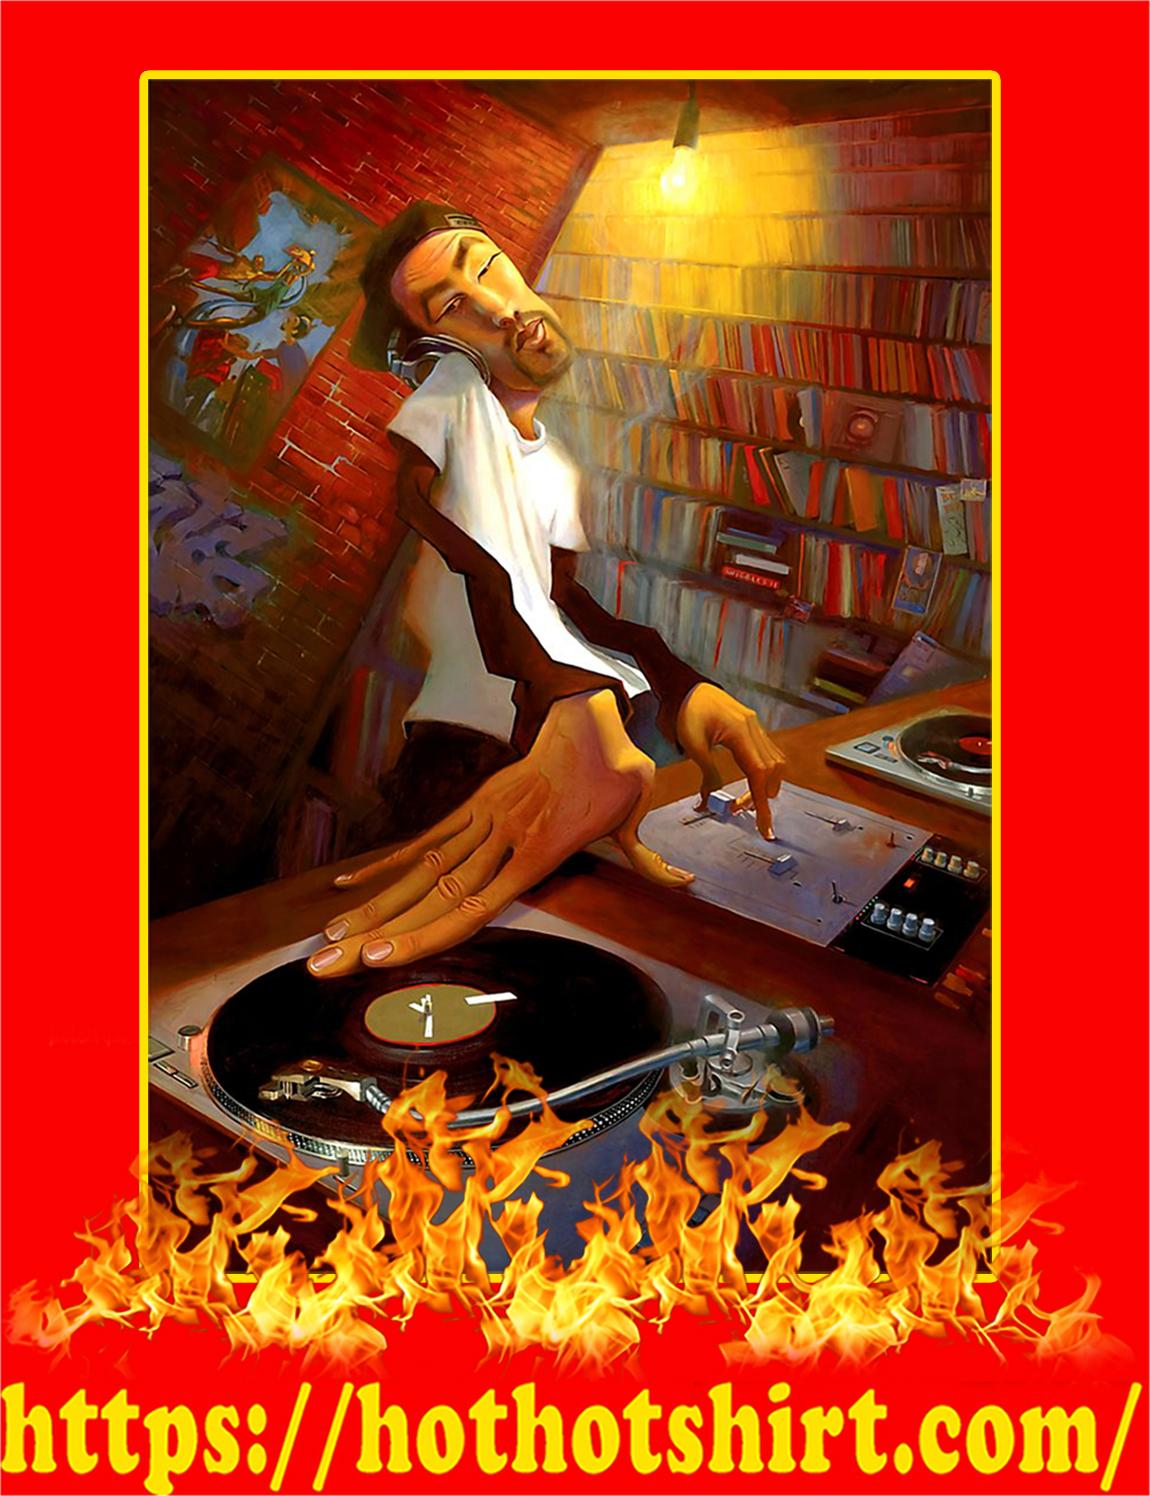 Justin Bua DJ Man Spinning Poster - A1